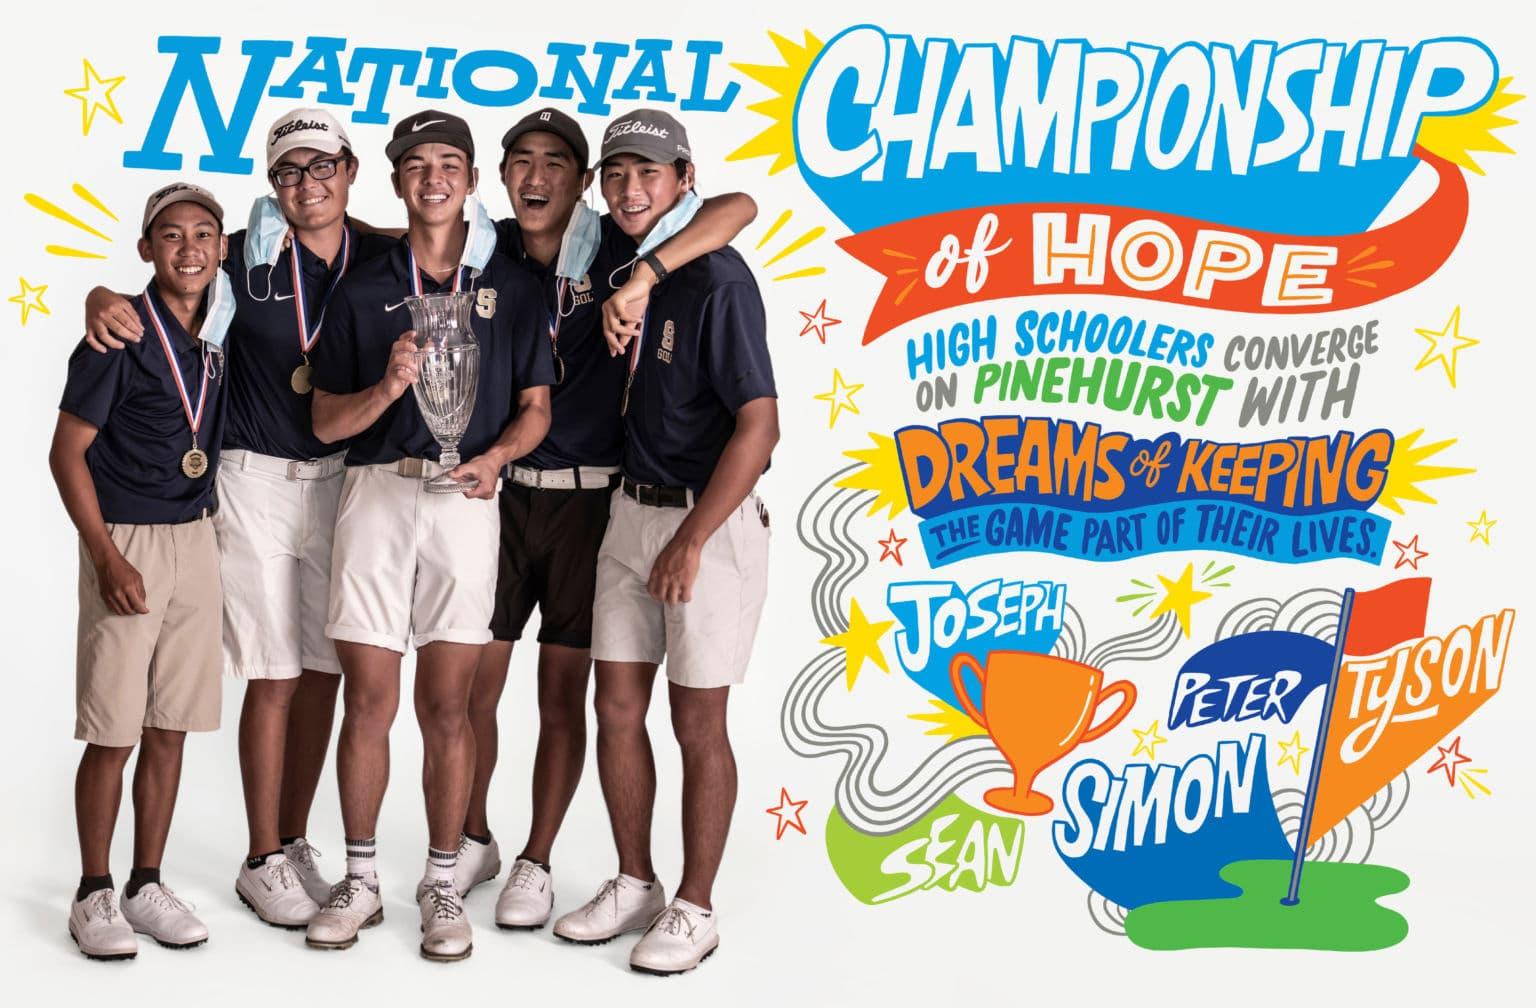 High School Golf National Championship in 2020